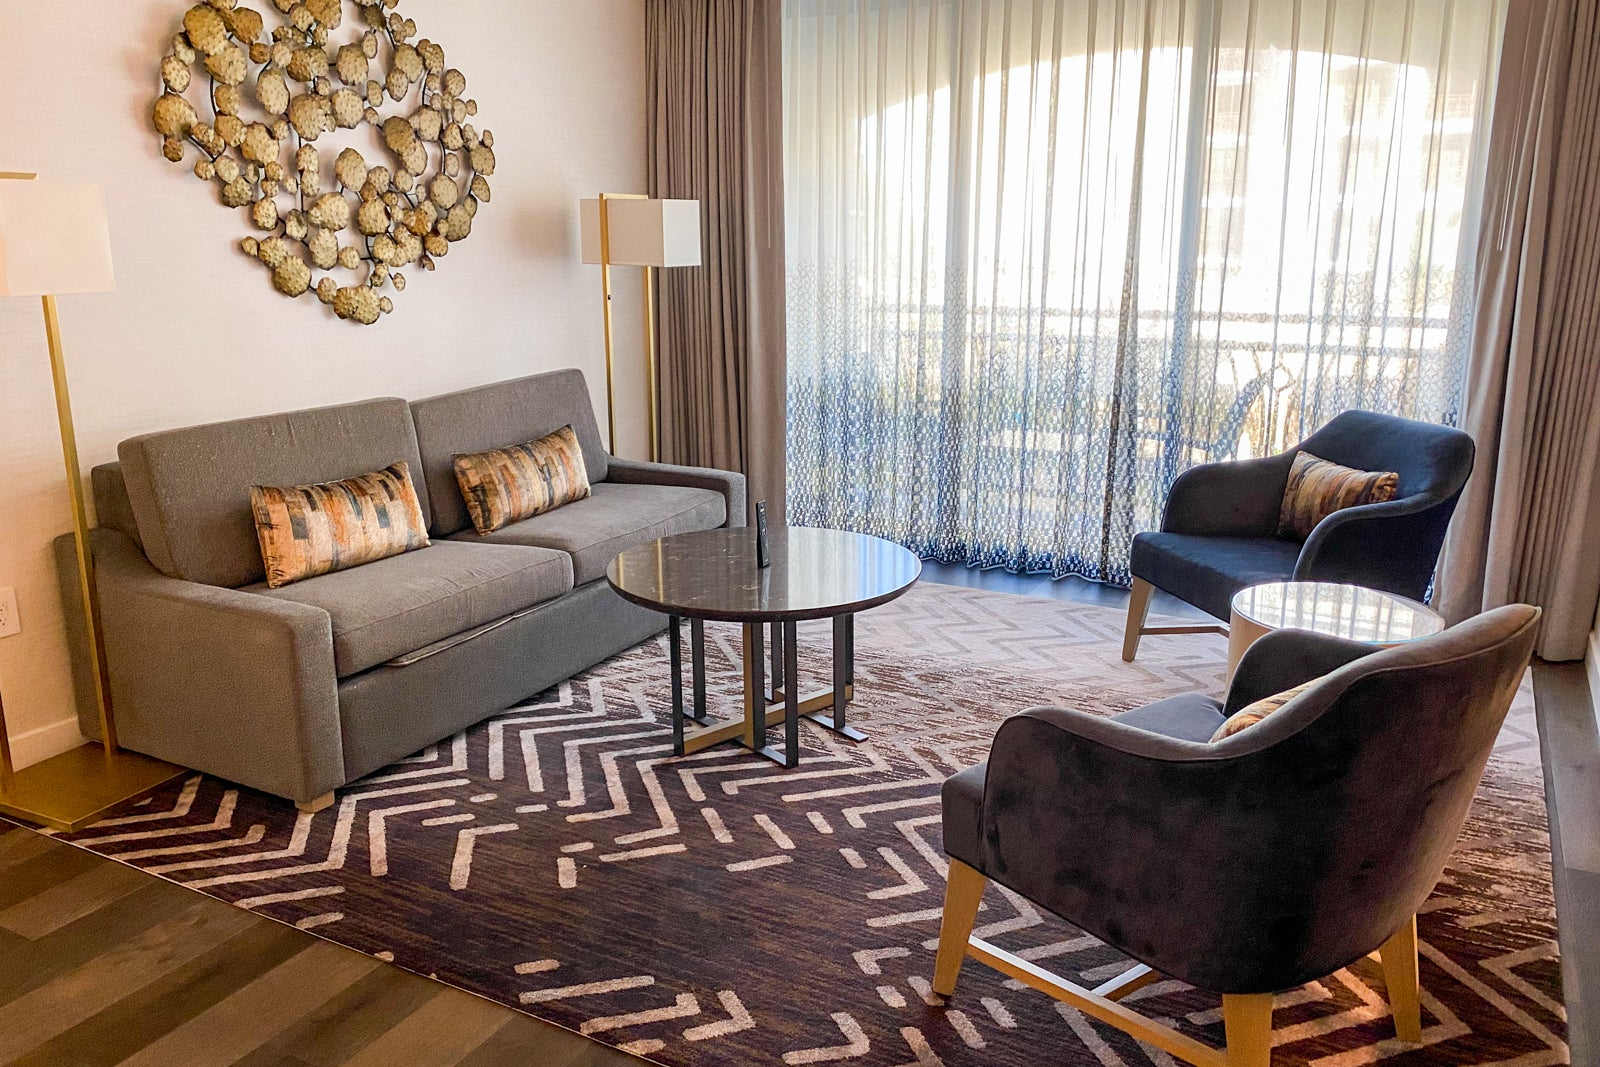 Luxury within walking distance to Disneyland: The new Westin Anaheim